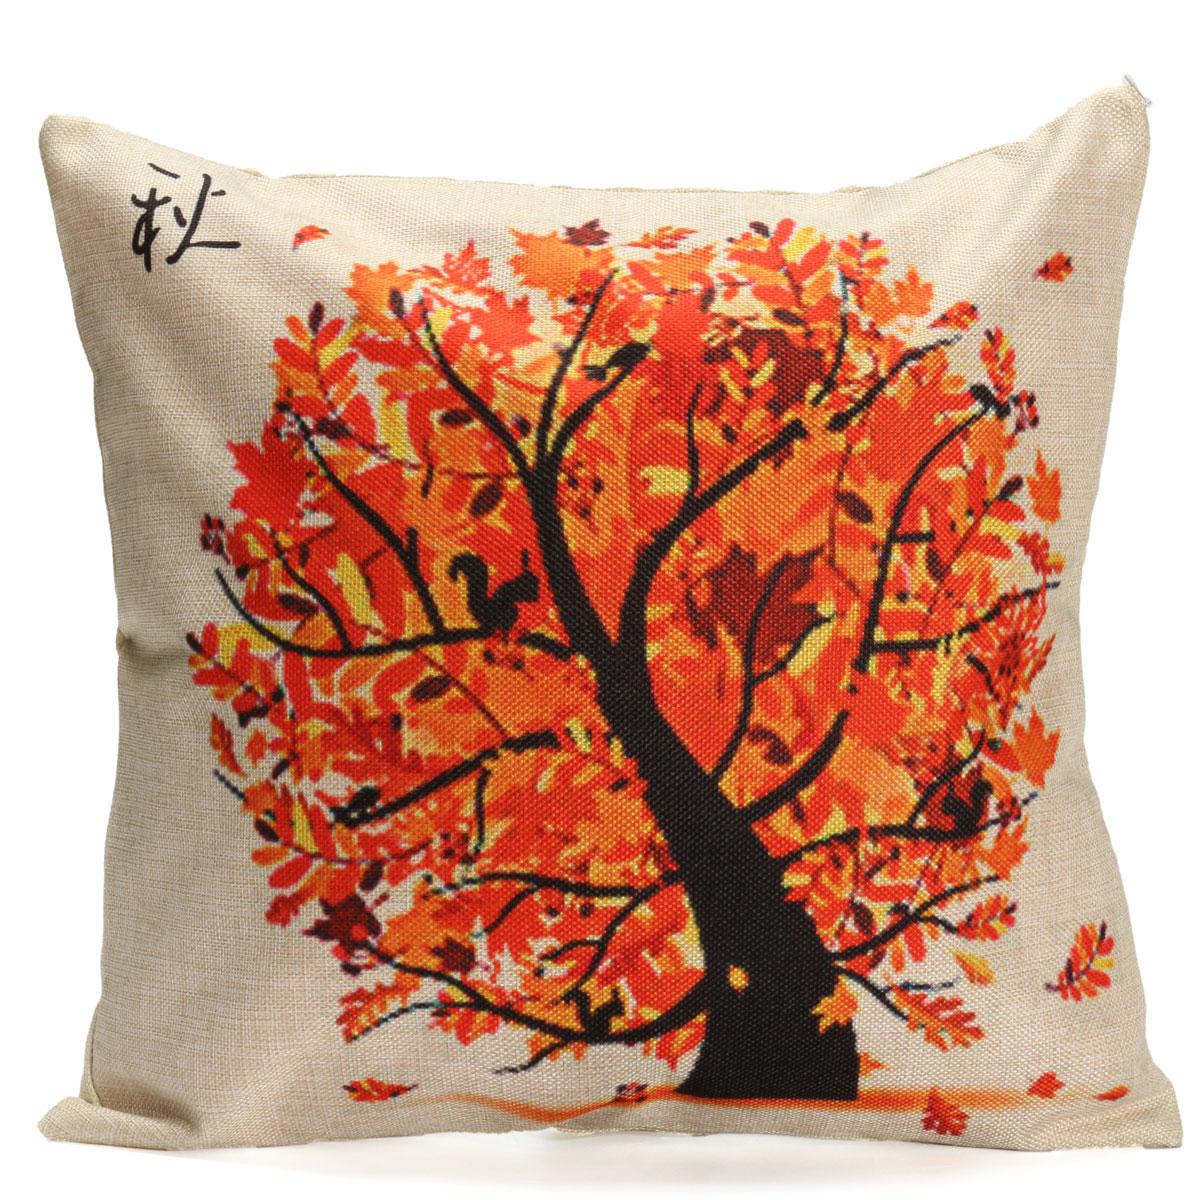 Dark Orange Decorative Pillows : Seasons Tree Cotton Linen Throw Pillow Case Cushion Cover Home Sofa Decoration Dark Orange ...